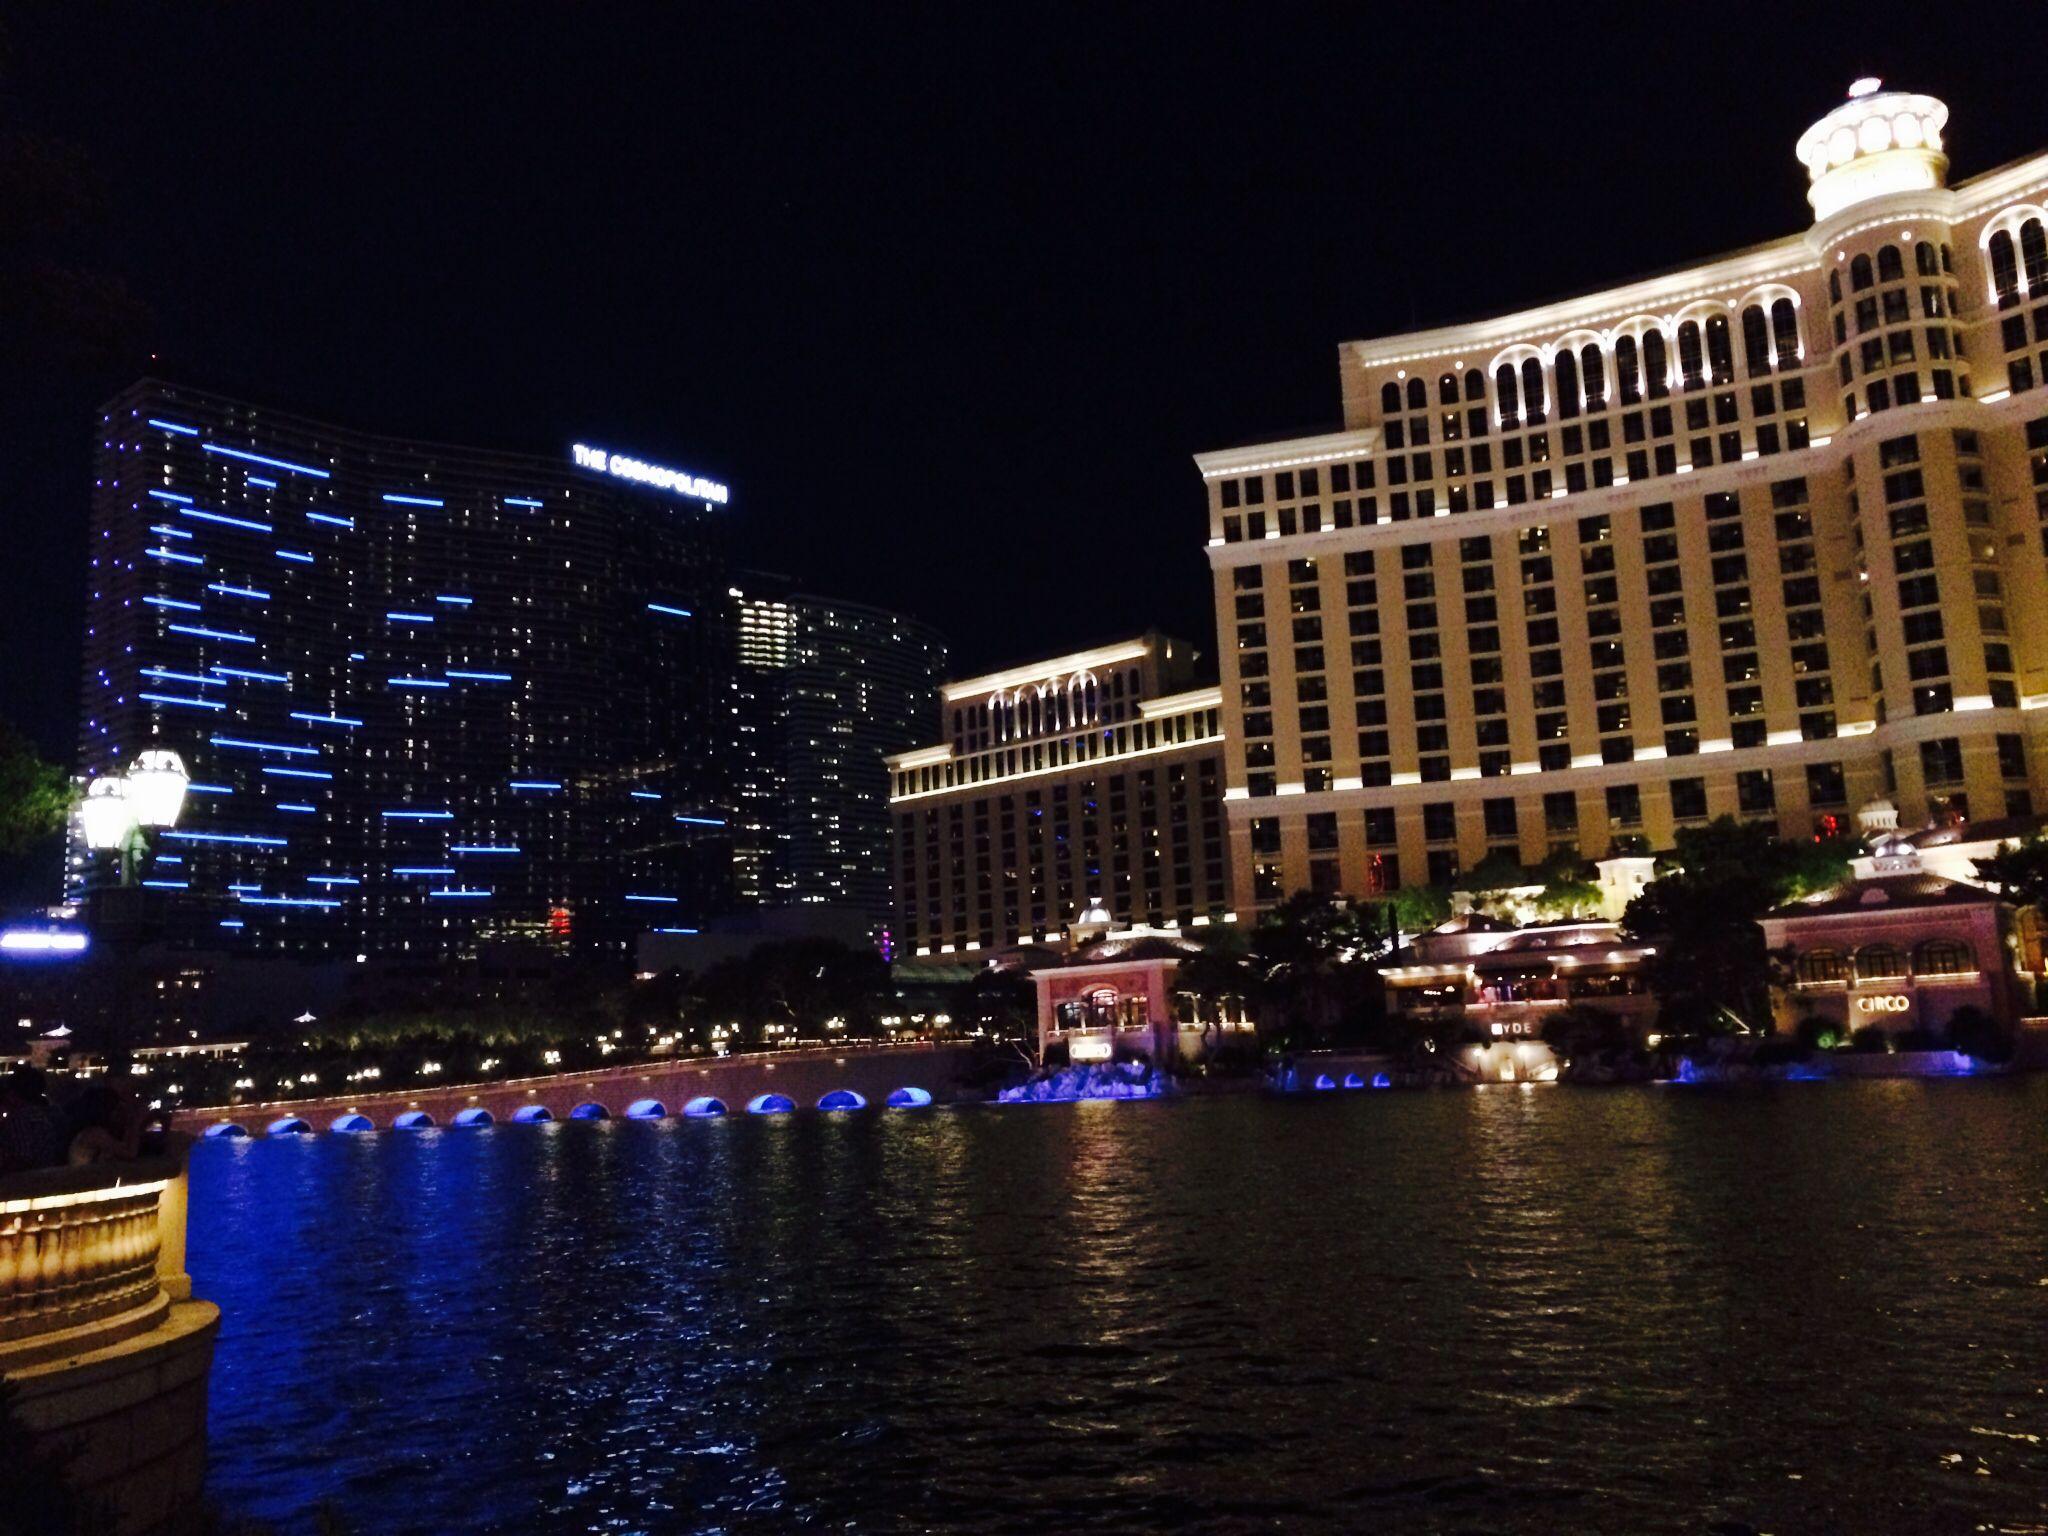 Bellagio and Cosmopolitan in Las Vegas